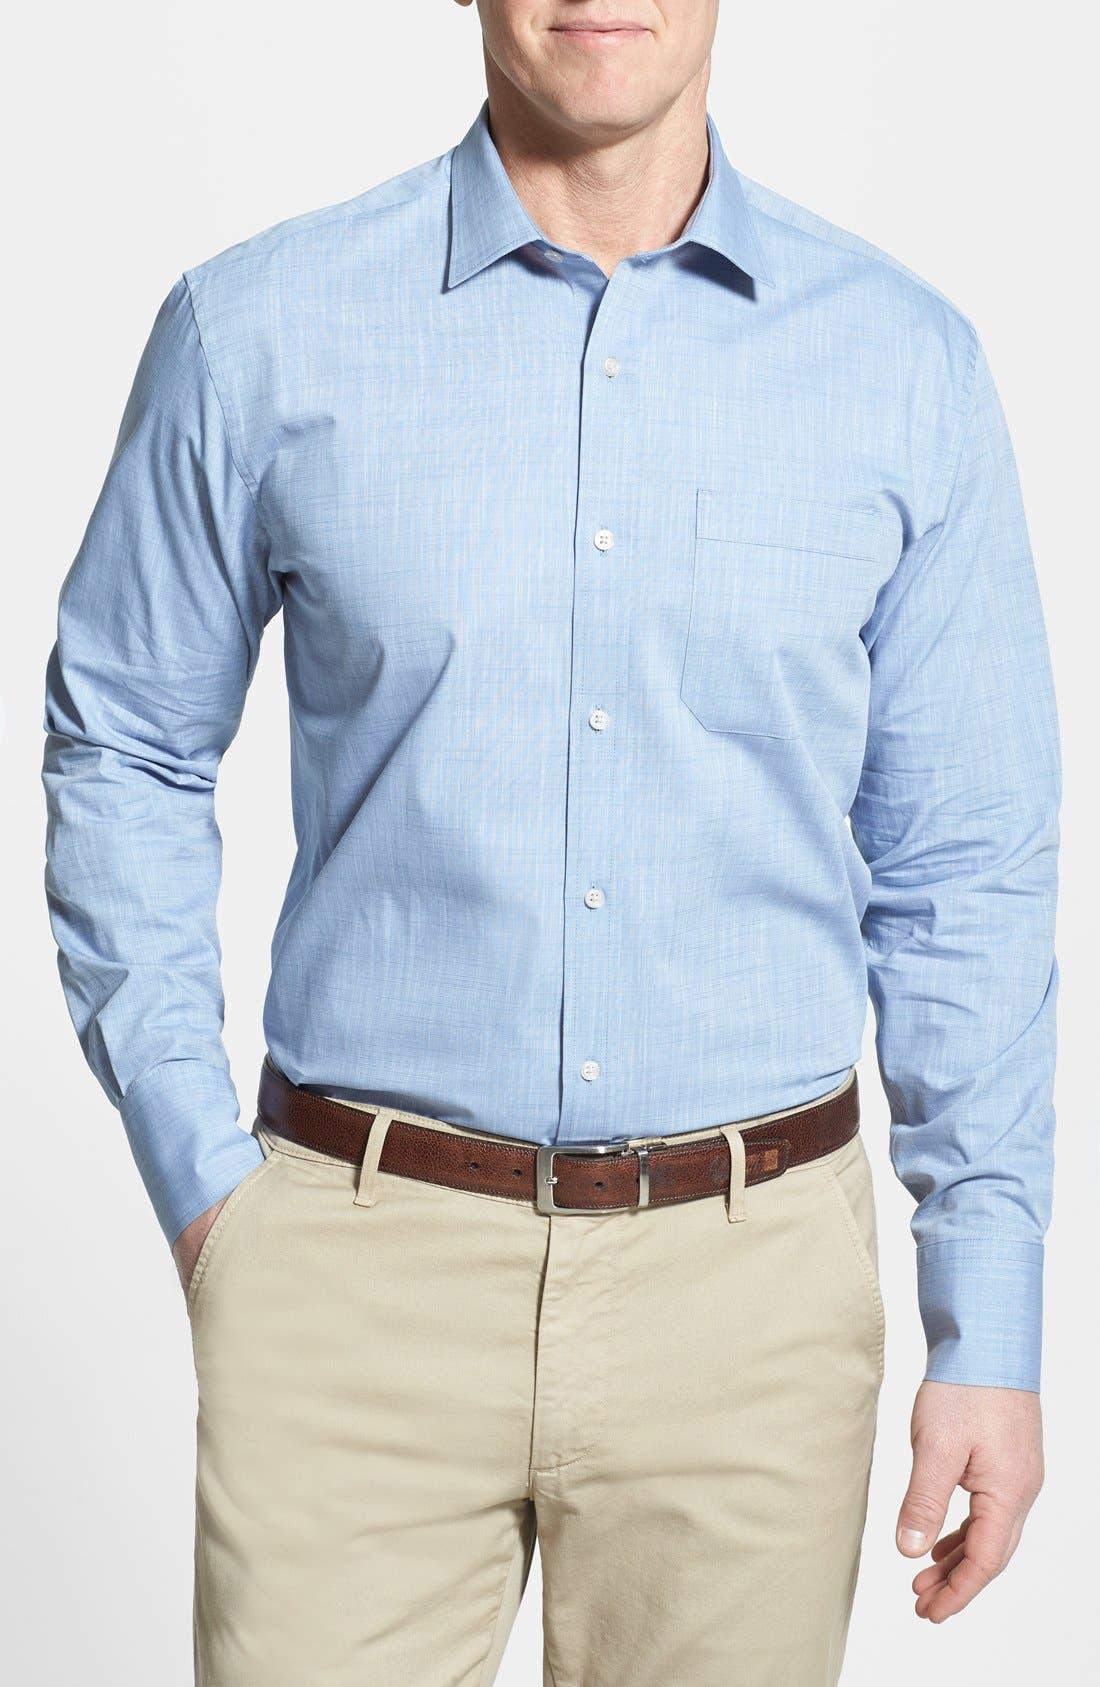 Alternate Image 1 Selected - Cutter & Buck 'Meadows' Oxford Sport Shirt (Big & Tall)